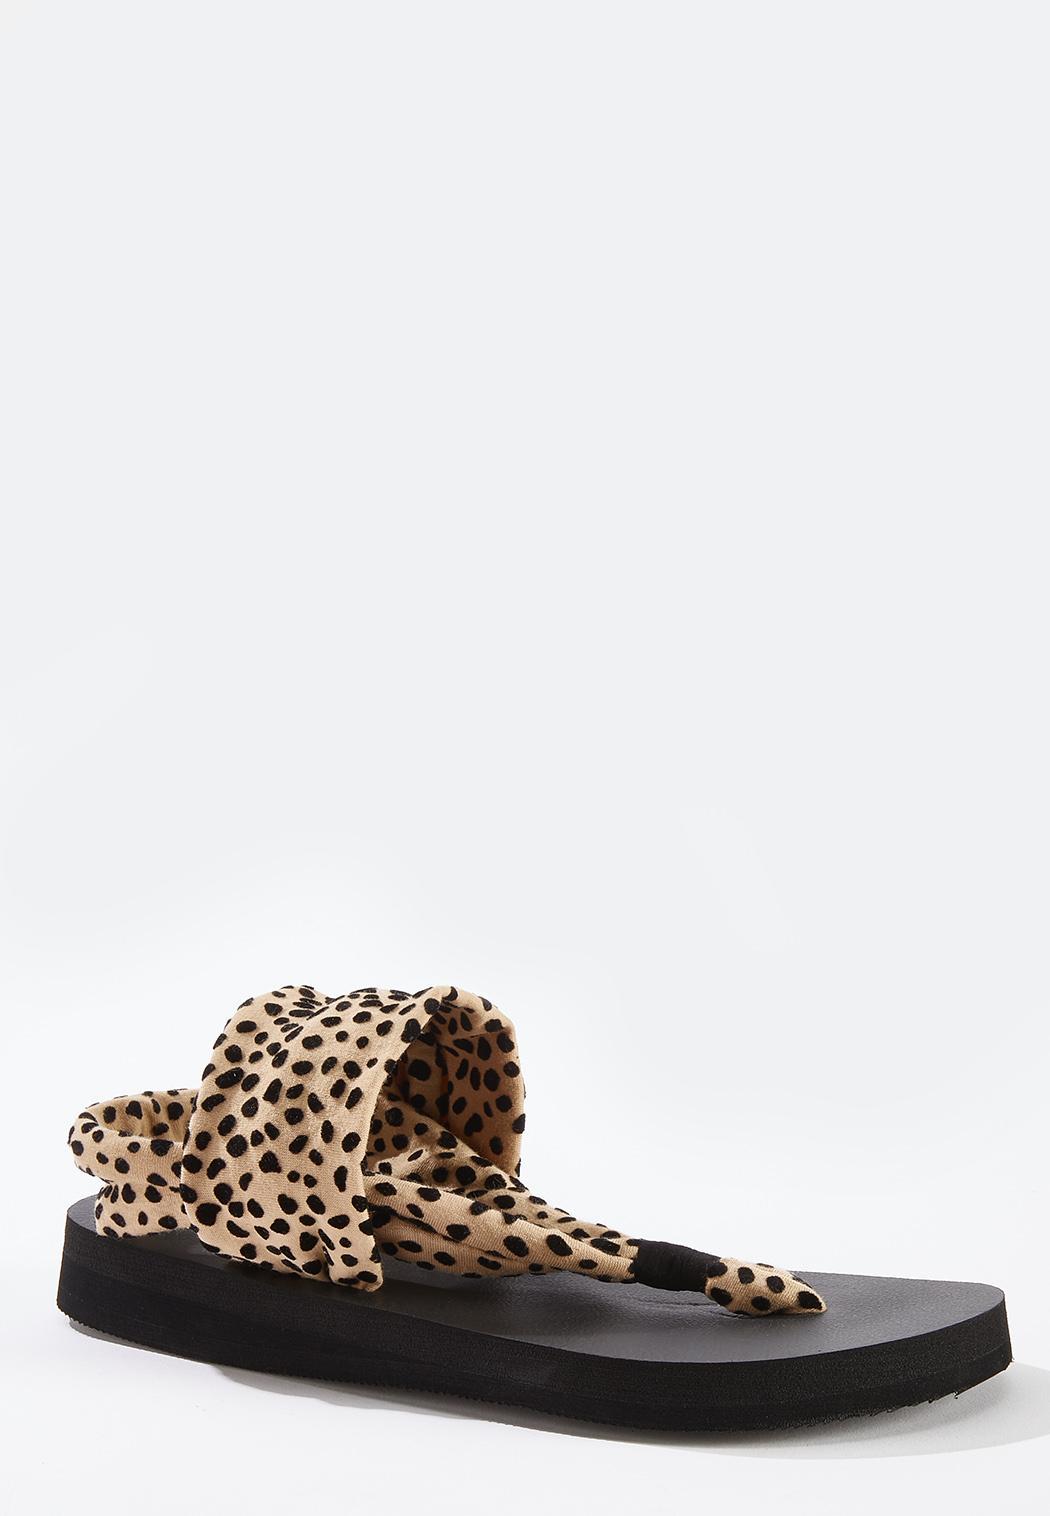 Leopard Fabric Band Flip Flops